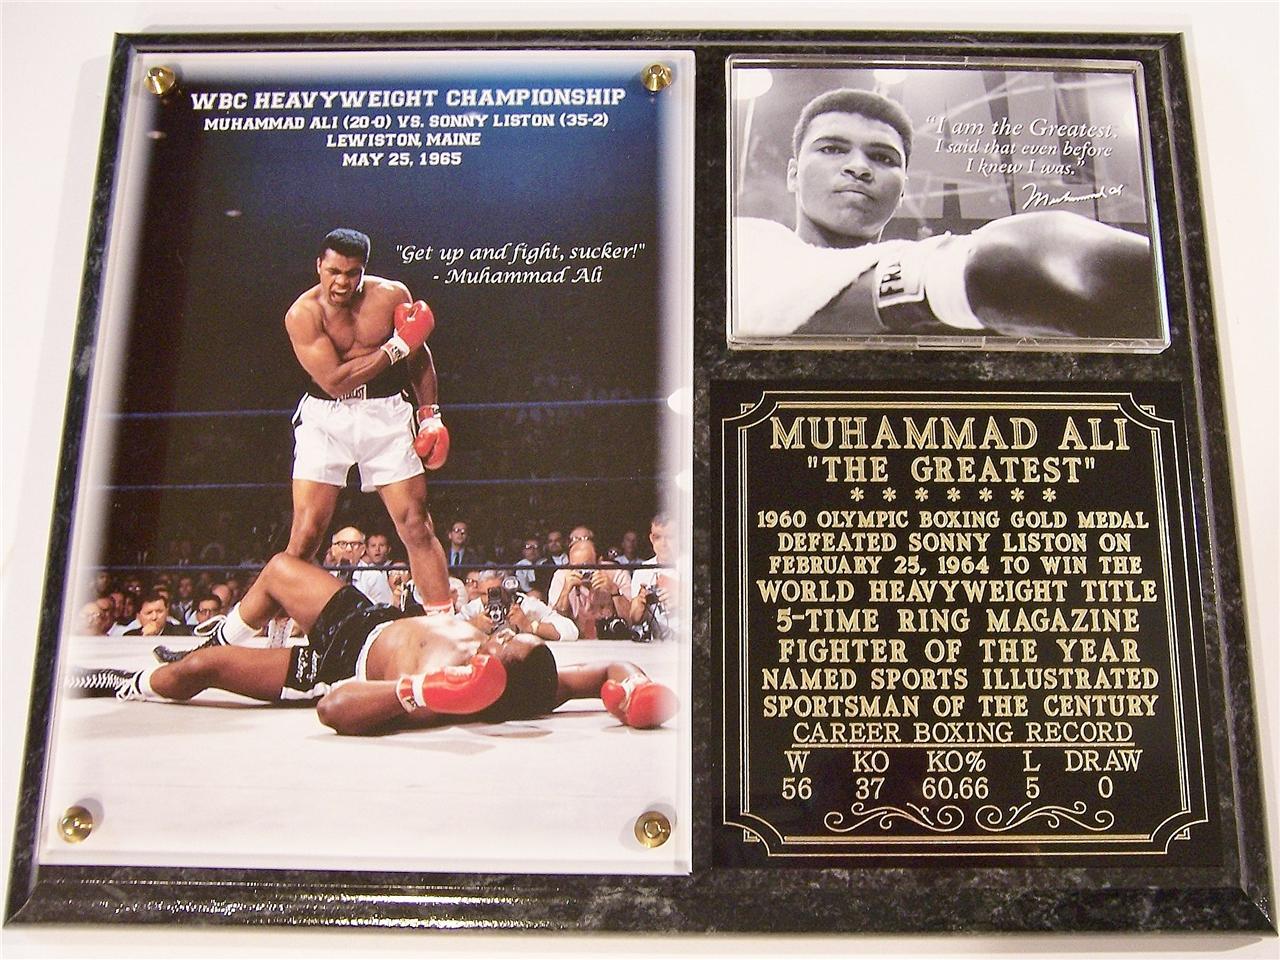 Muhammad-Ali-The-Greatest-Boxing-Hall-of-Fame-Photo-Plaque-Thrilla-in-Manila